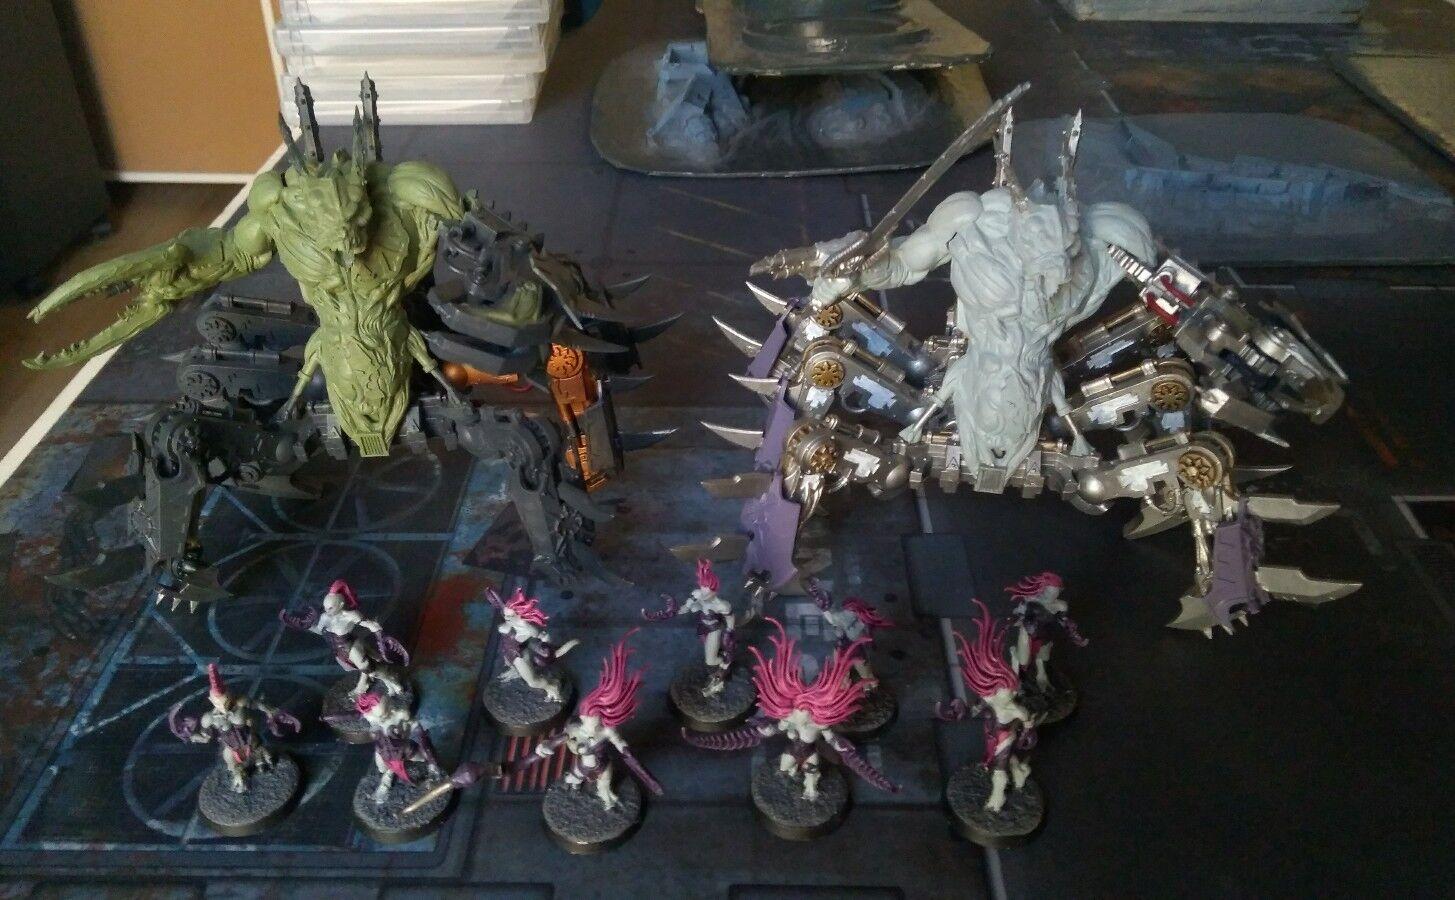 Massive Warhammer Chaos Daemons Army Demons 40k 40,000 Lot Armata Demoni Lotto